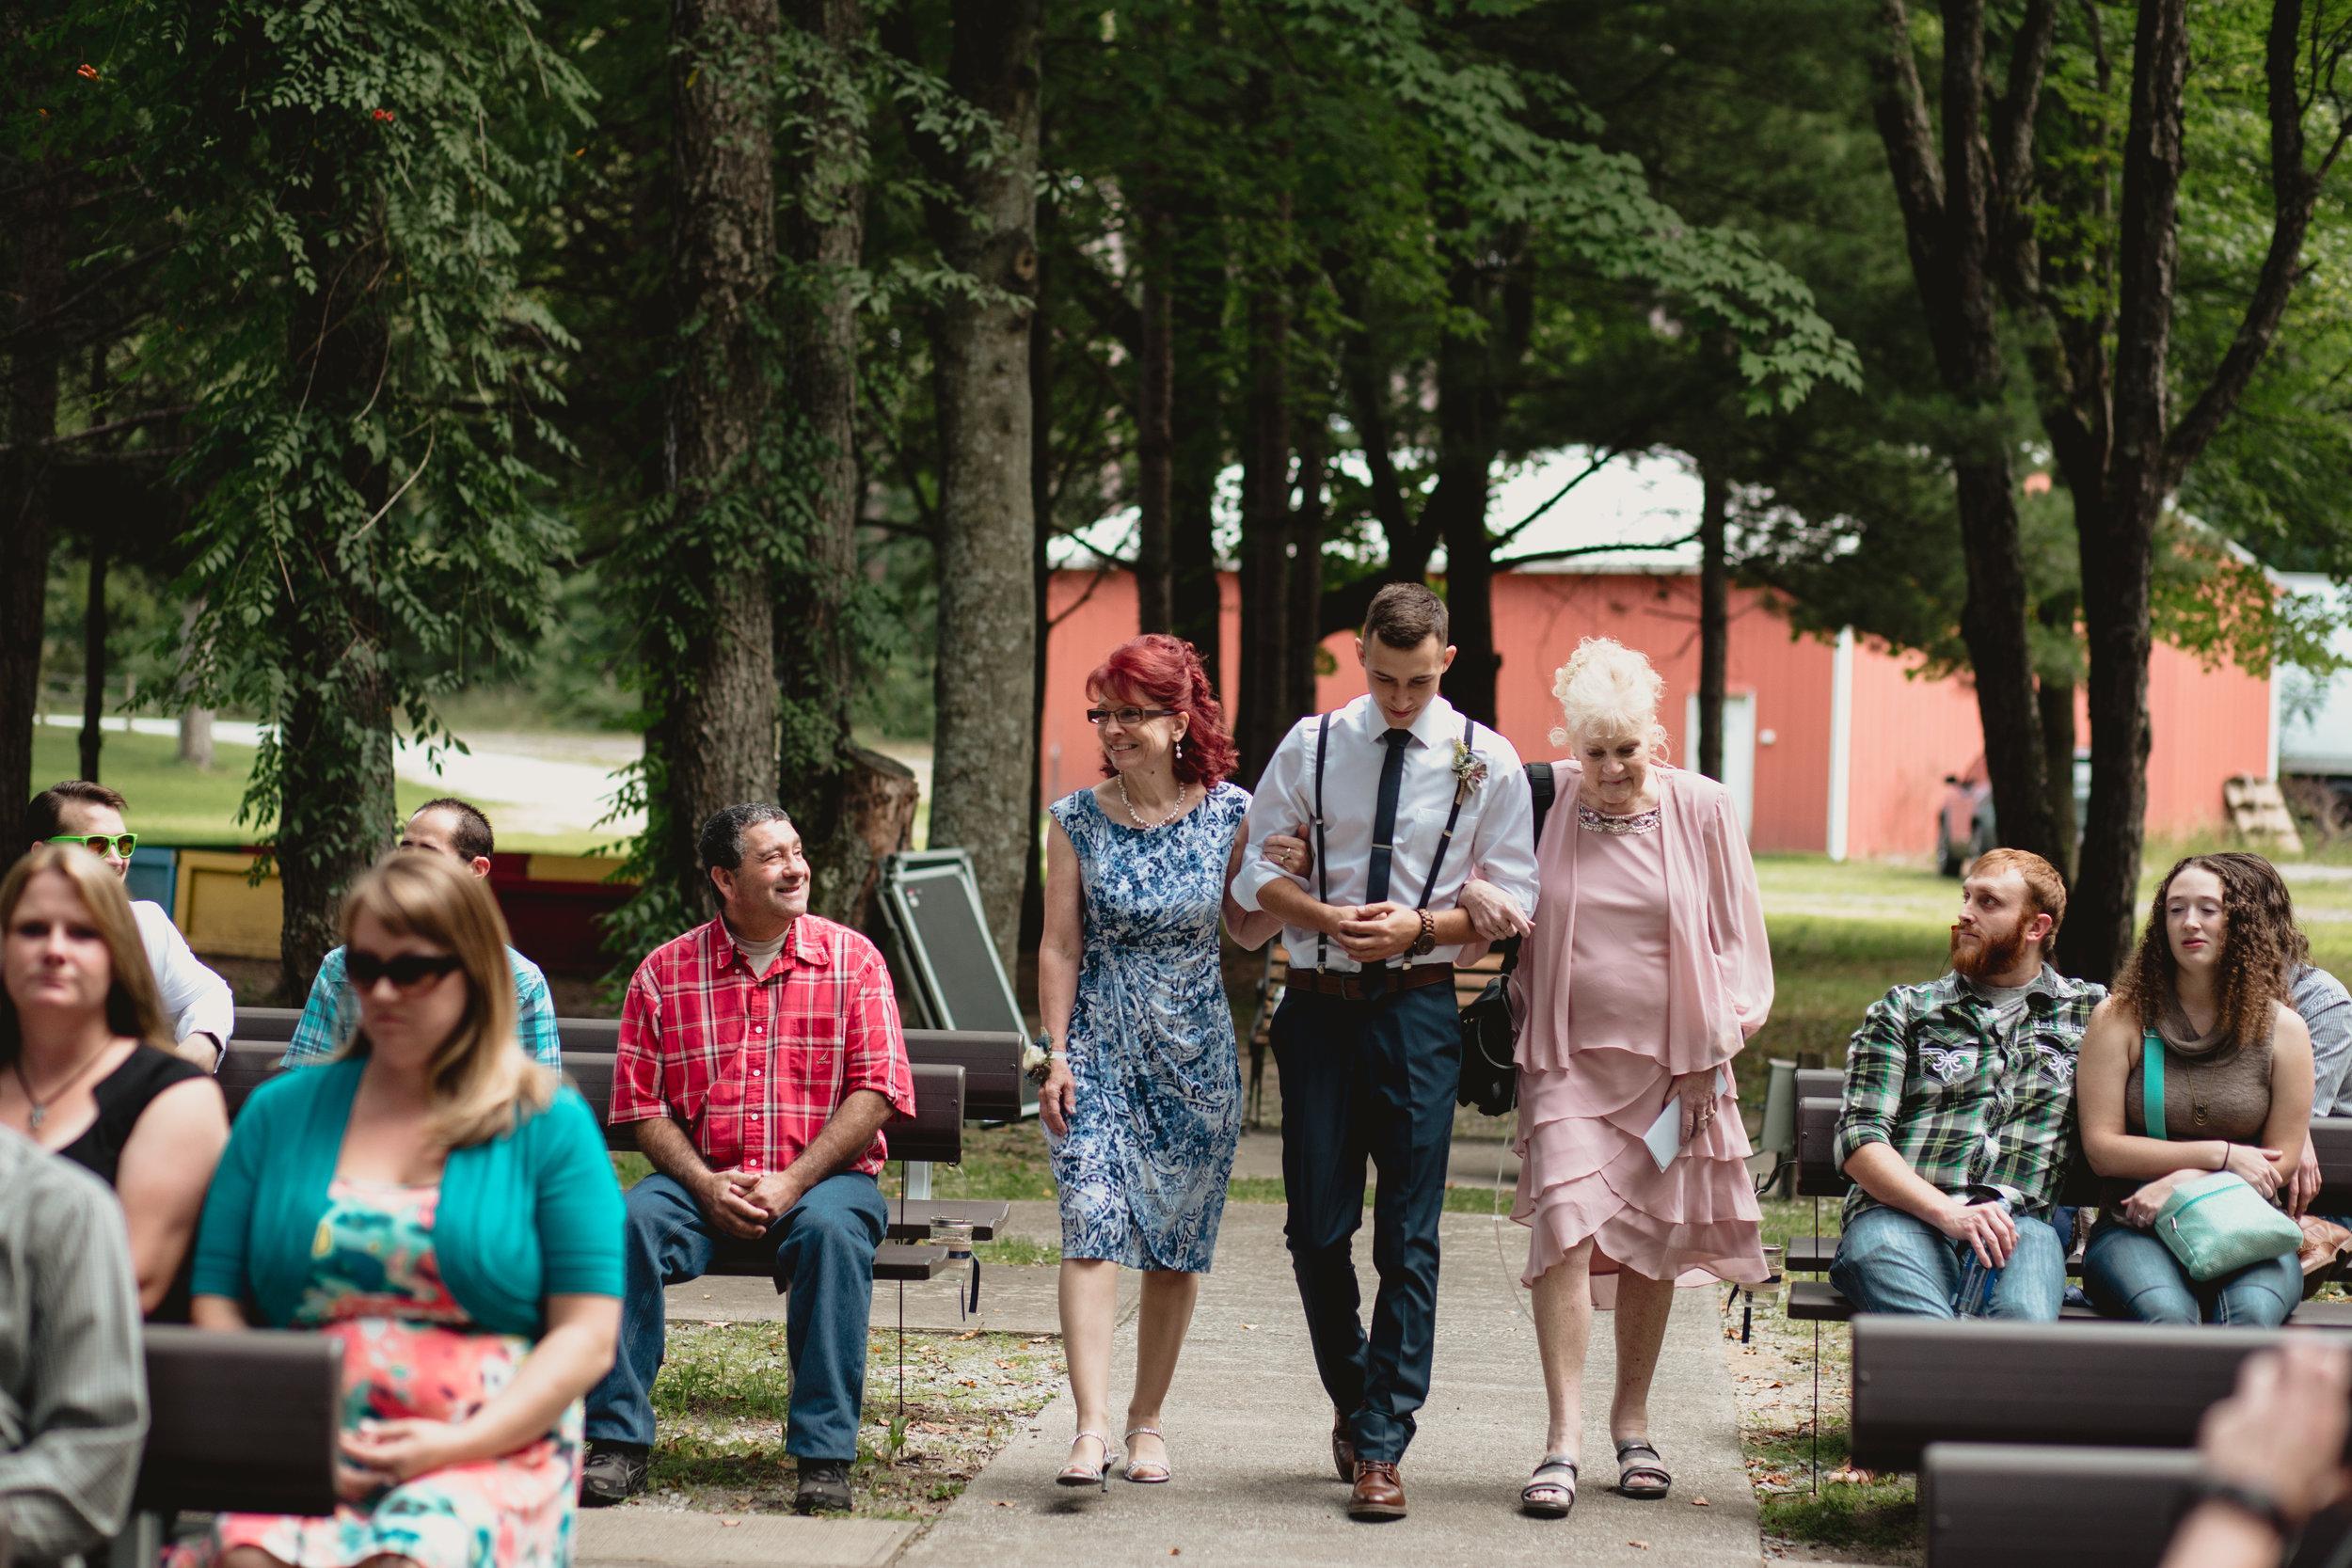 west-michigan-wedding-photographer-whitehall-rachel-austin-chapel-in-the-pines-203.jpg